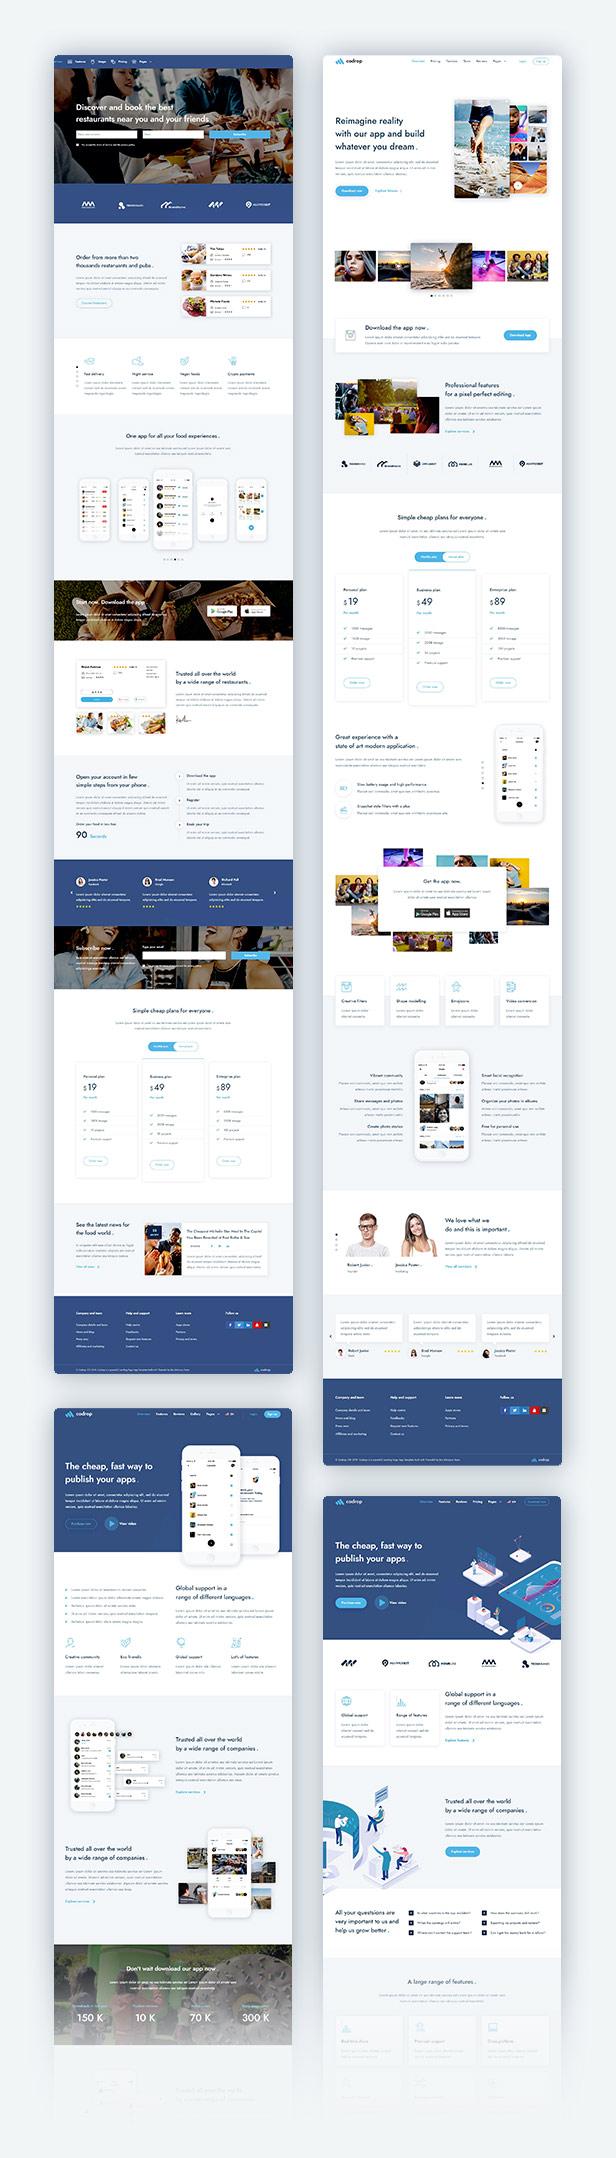 Cadrox - App Landing Page Theme - 1